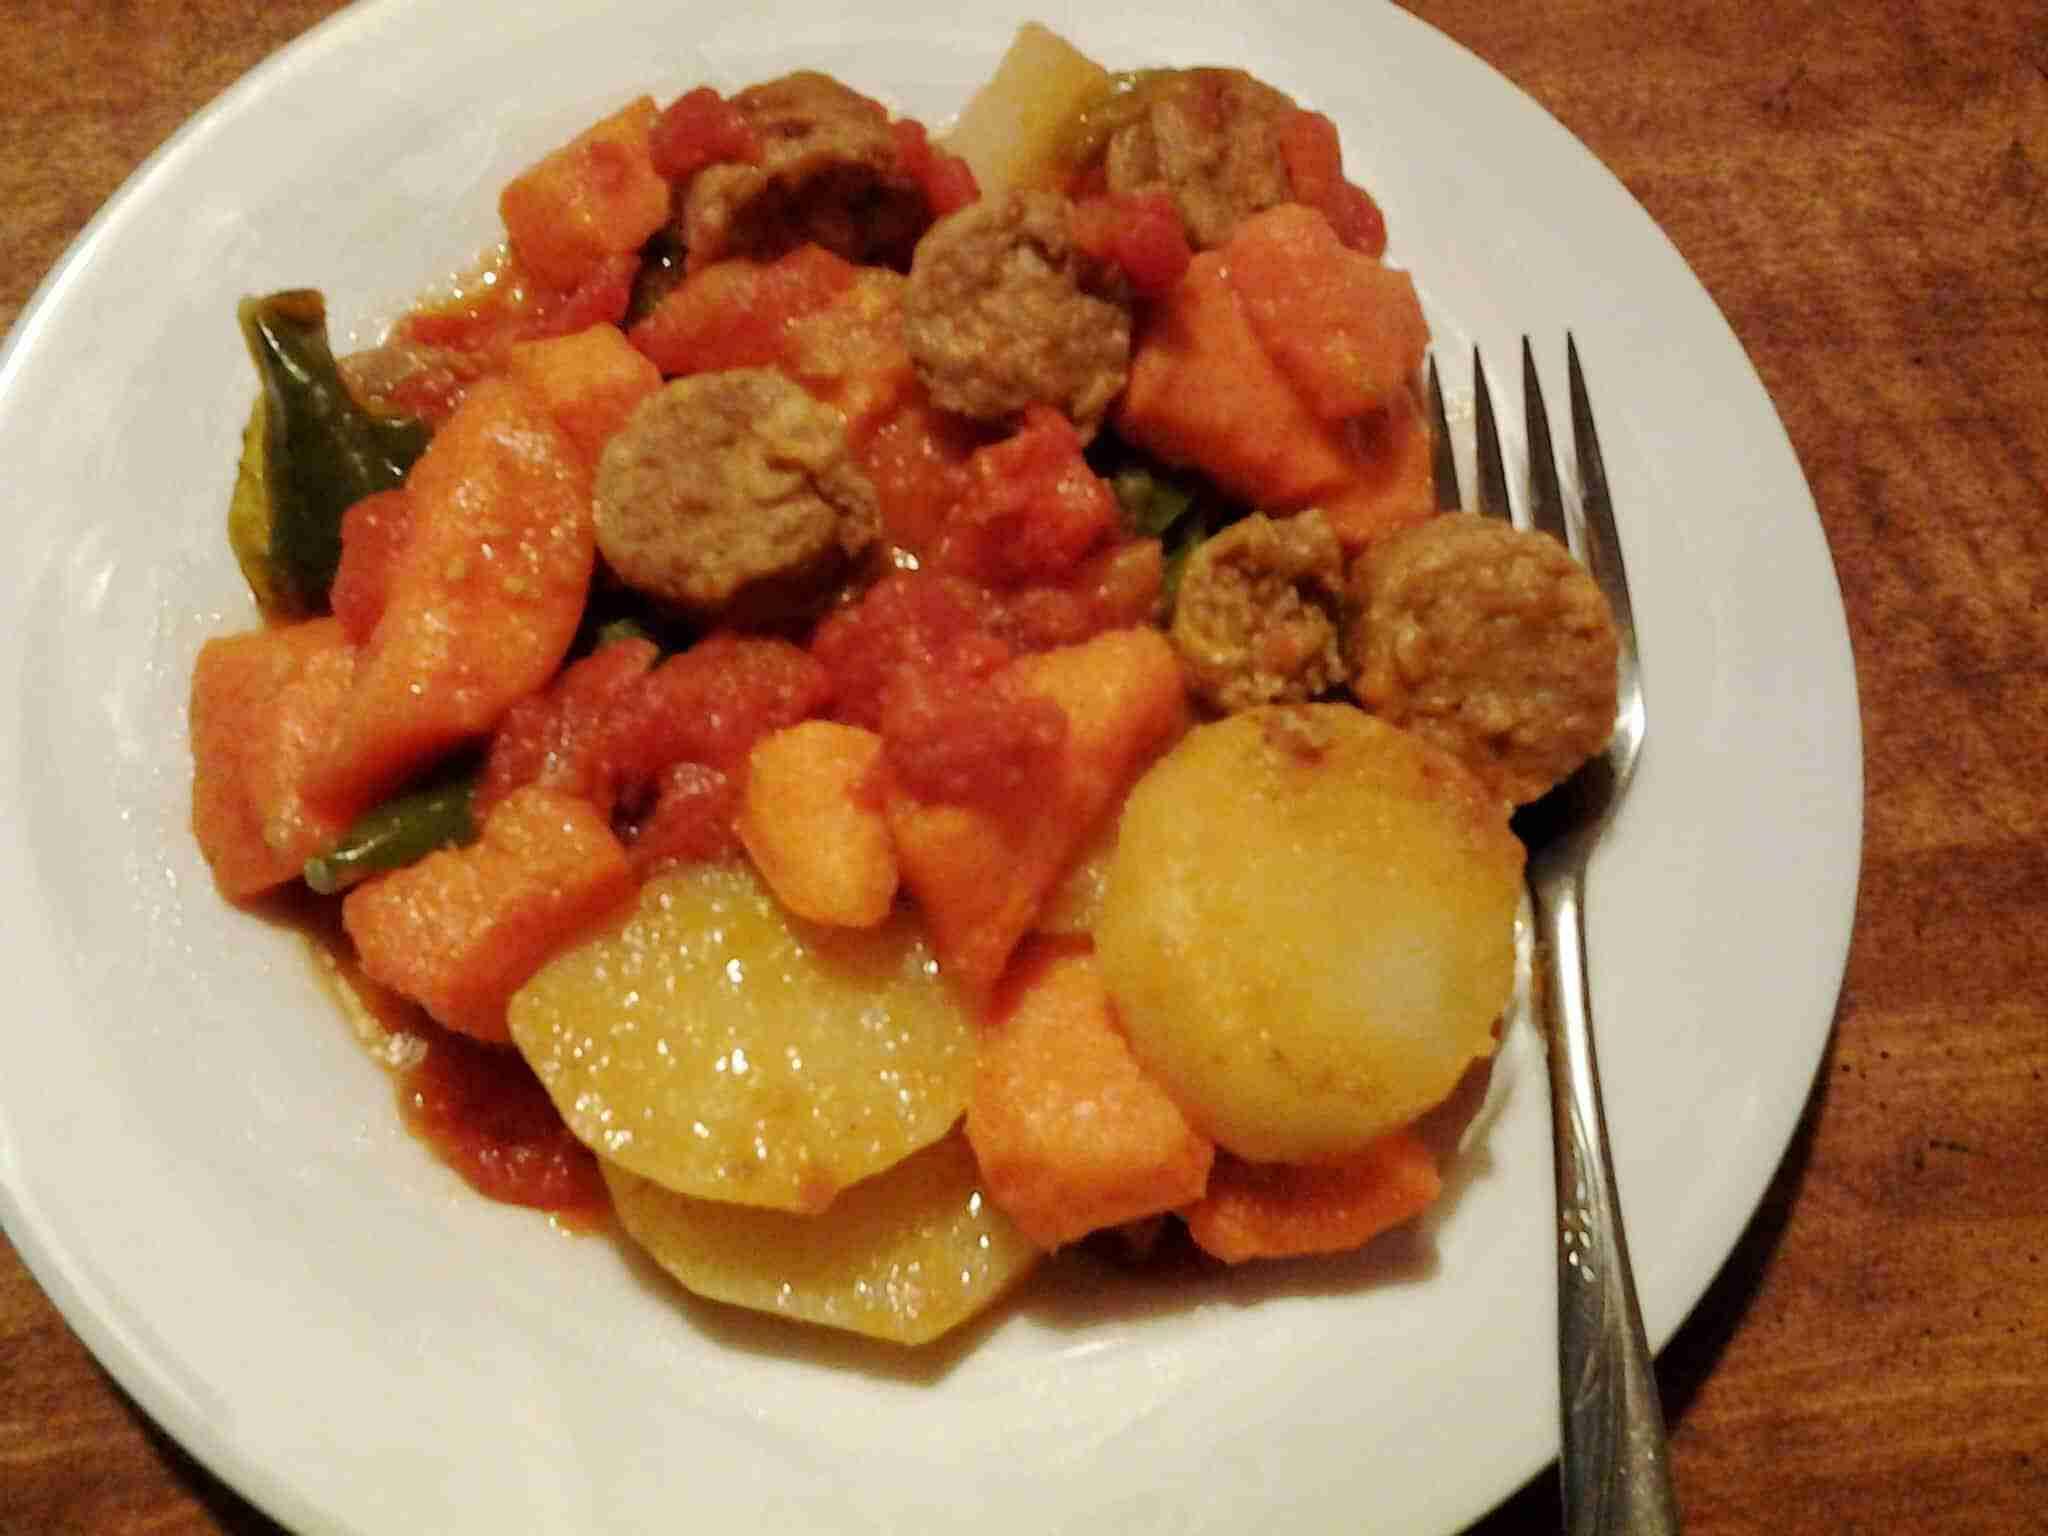 Sausage and Potato Skillet Dinner #Anolon - Daily Dish Magazine